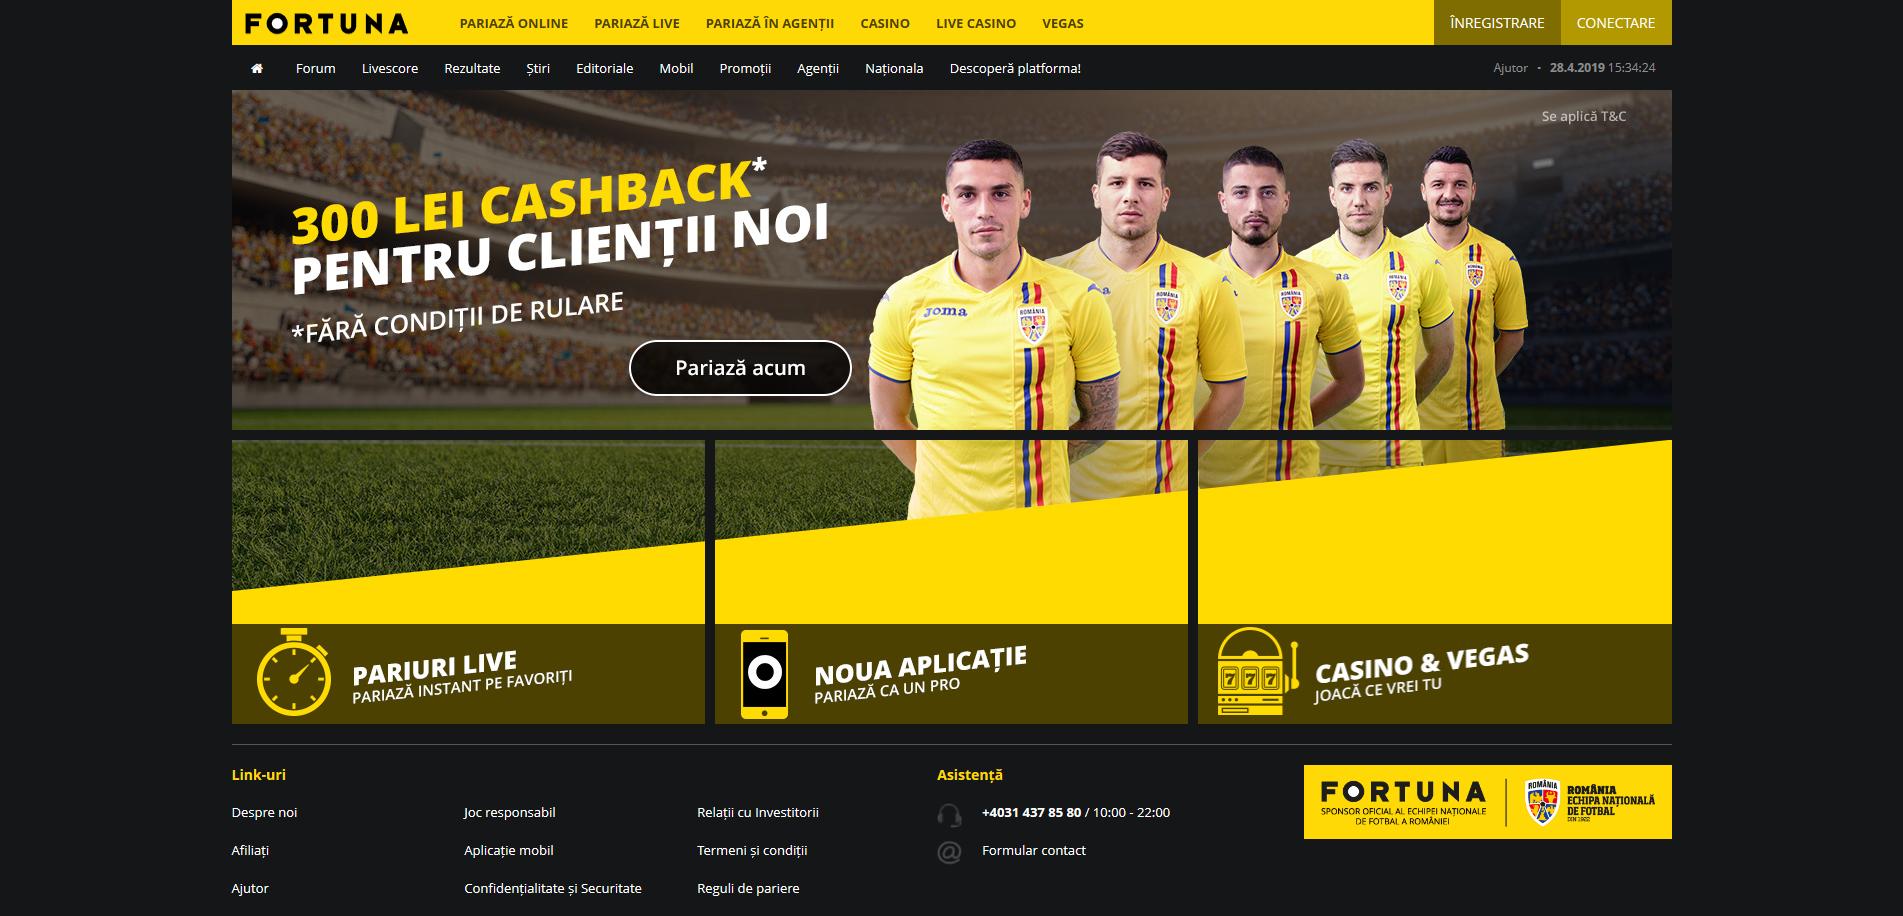 Fortuna website